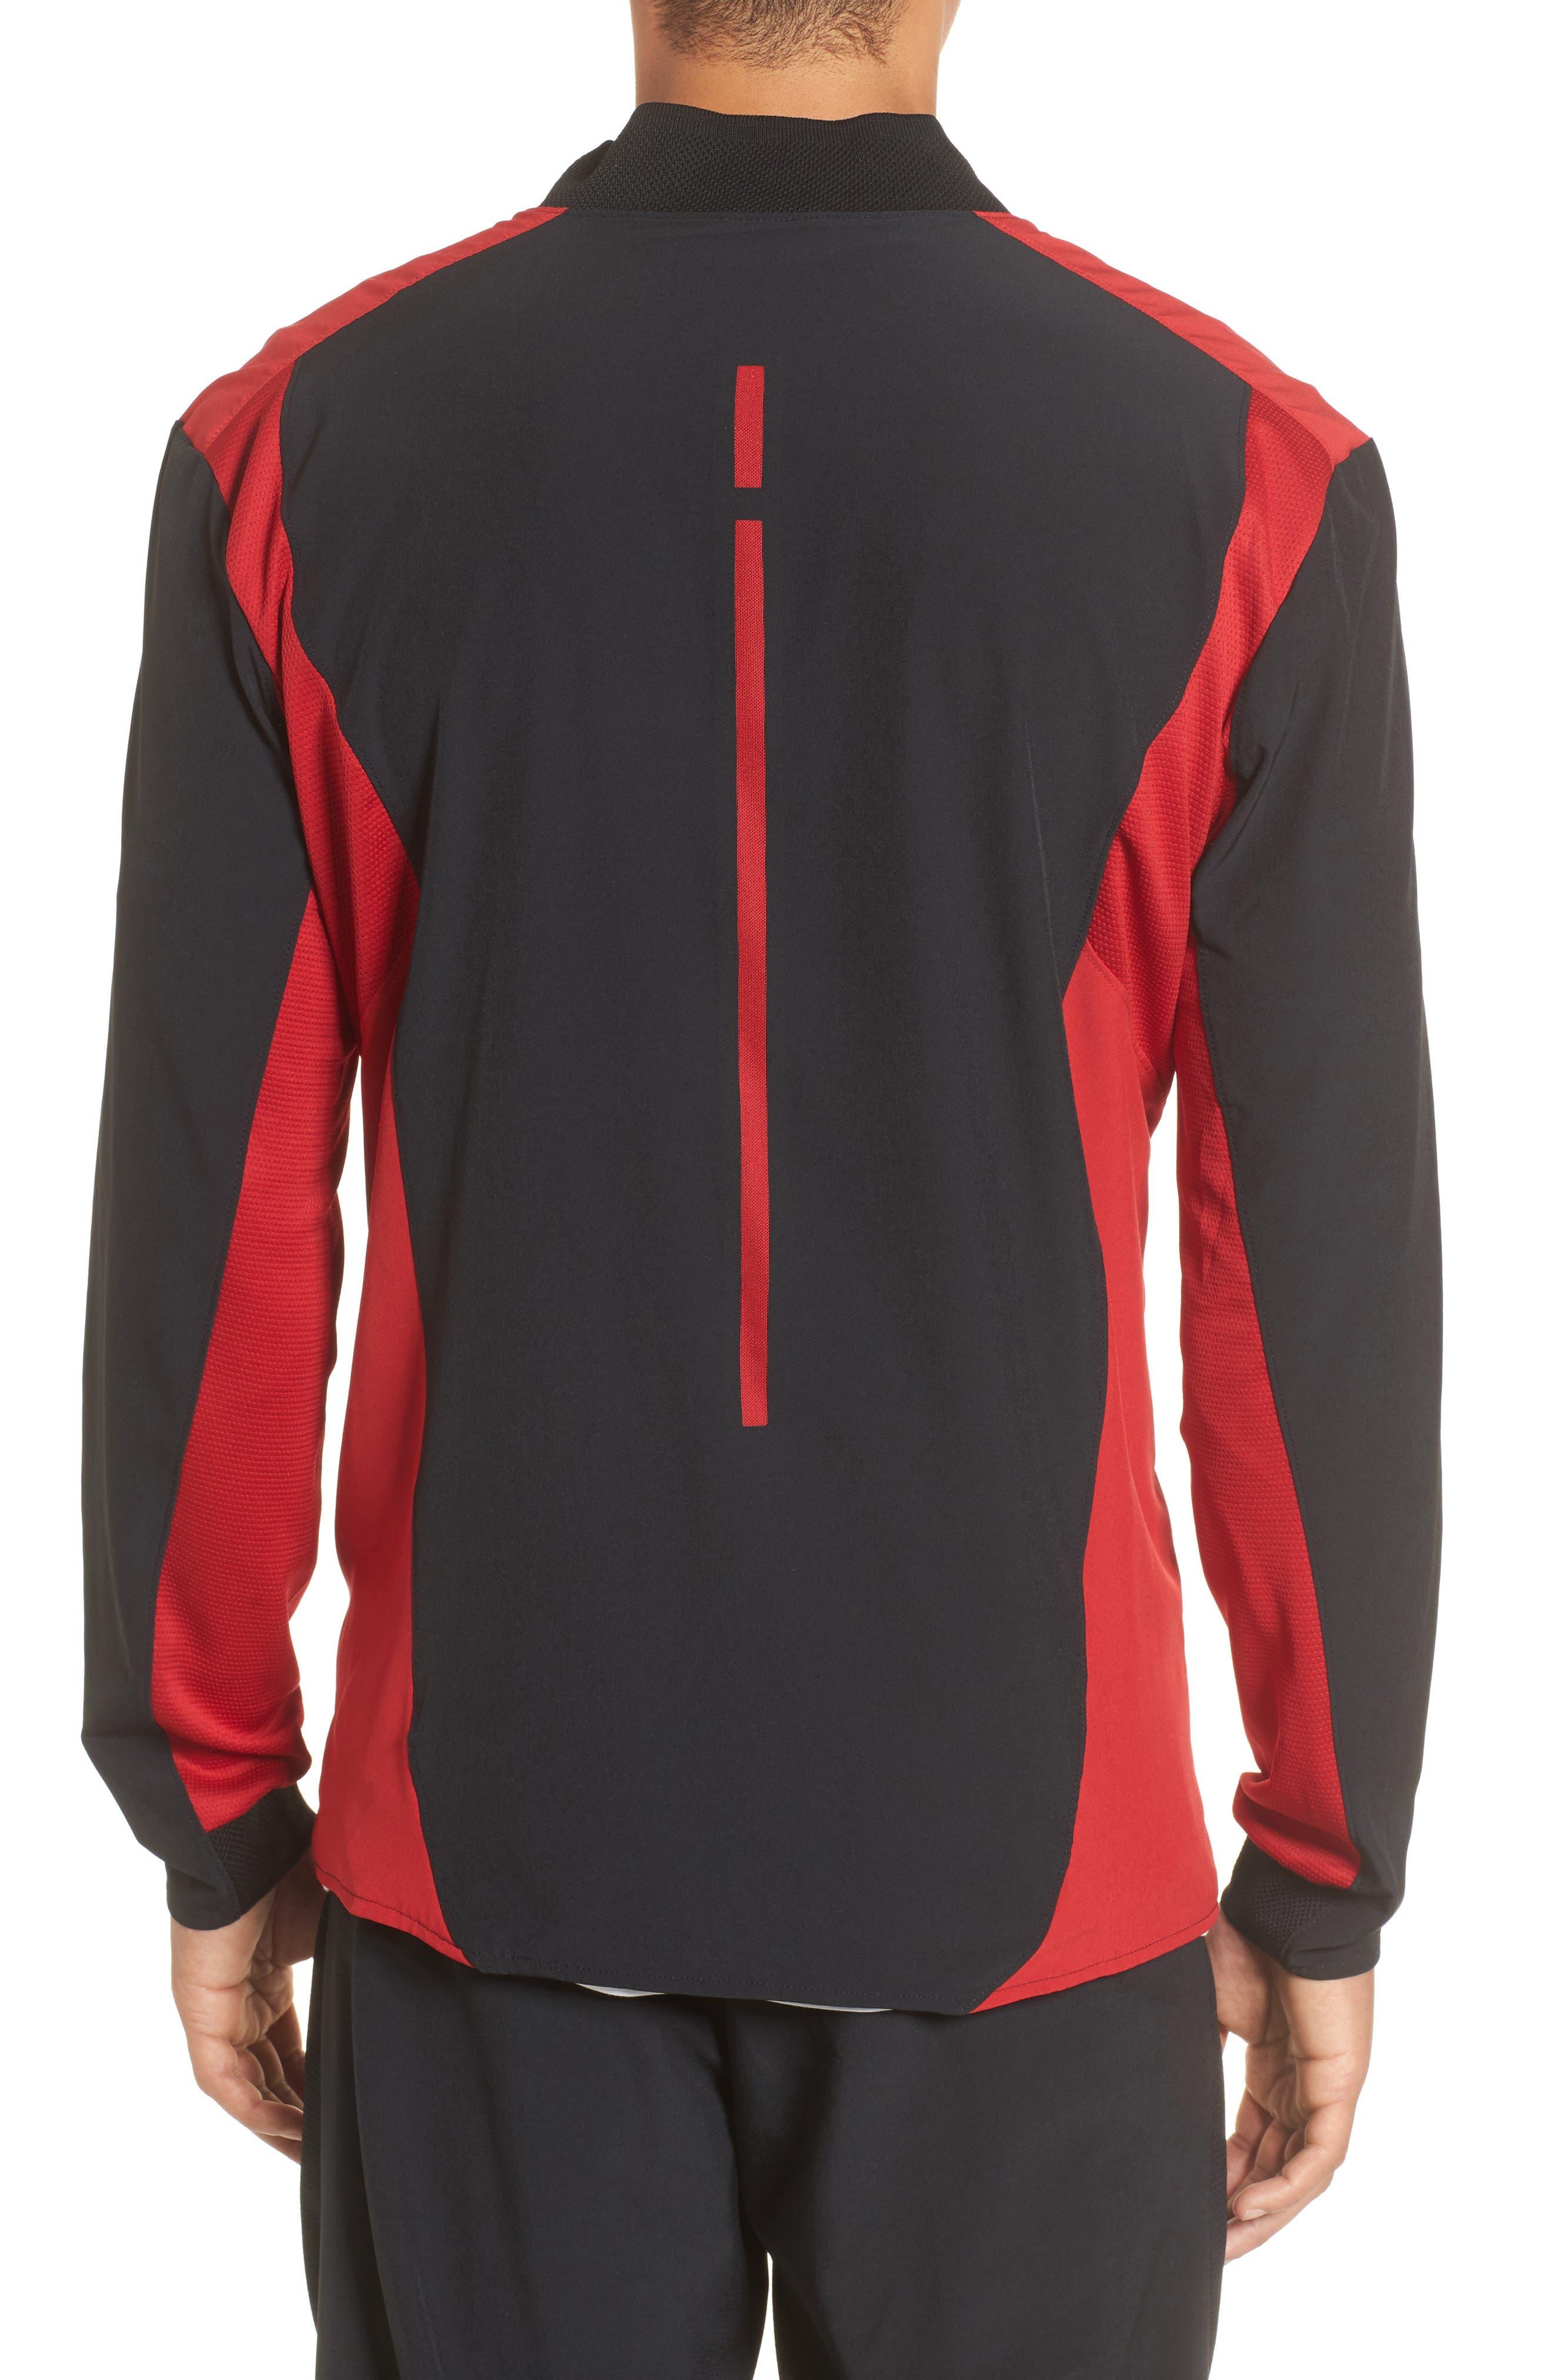 Ultimate Flight Zip Jacket,                             Alternate thumbnail 2, color,                             Black/ Gym Red